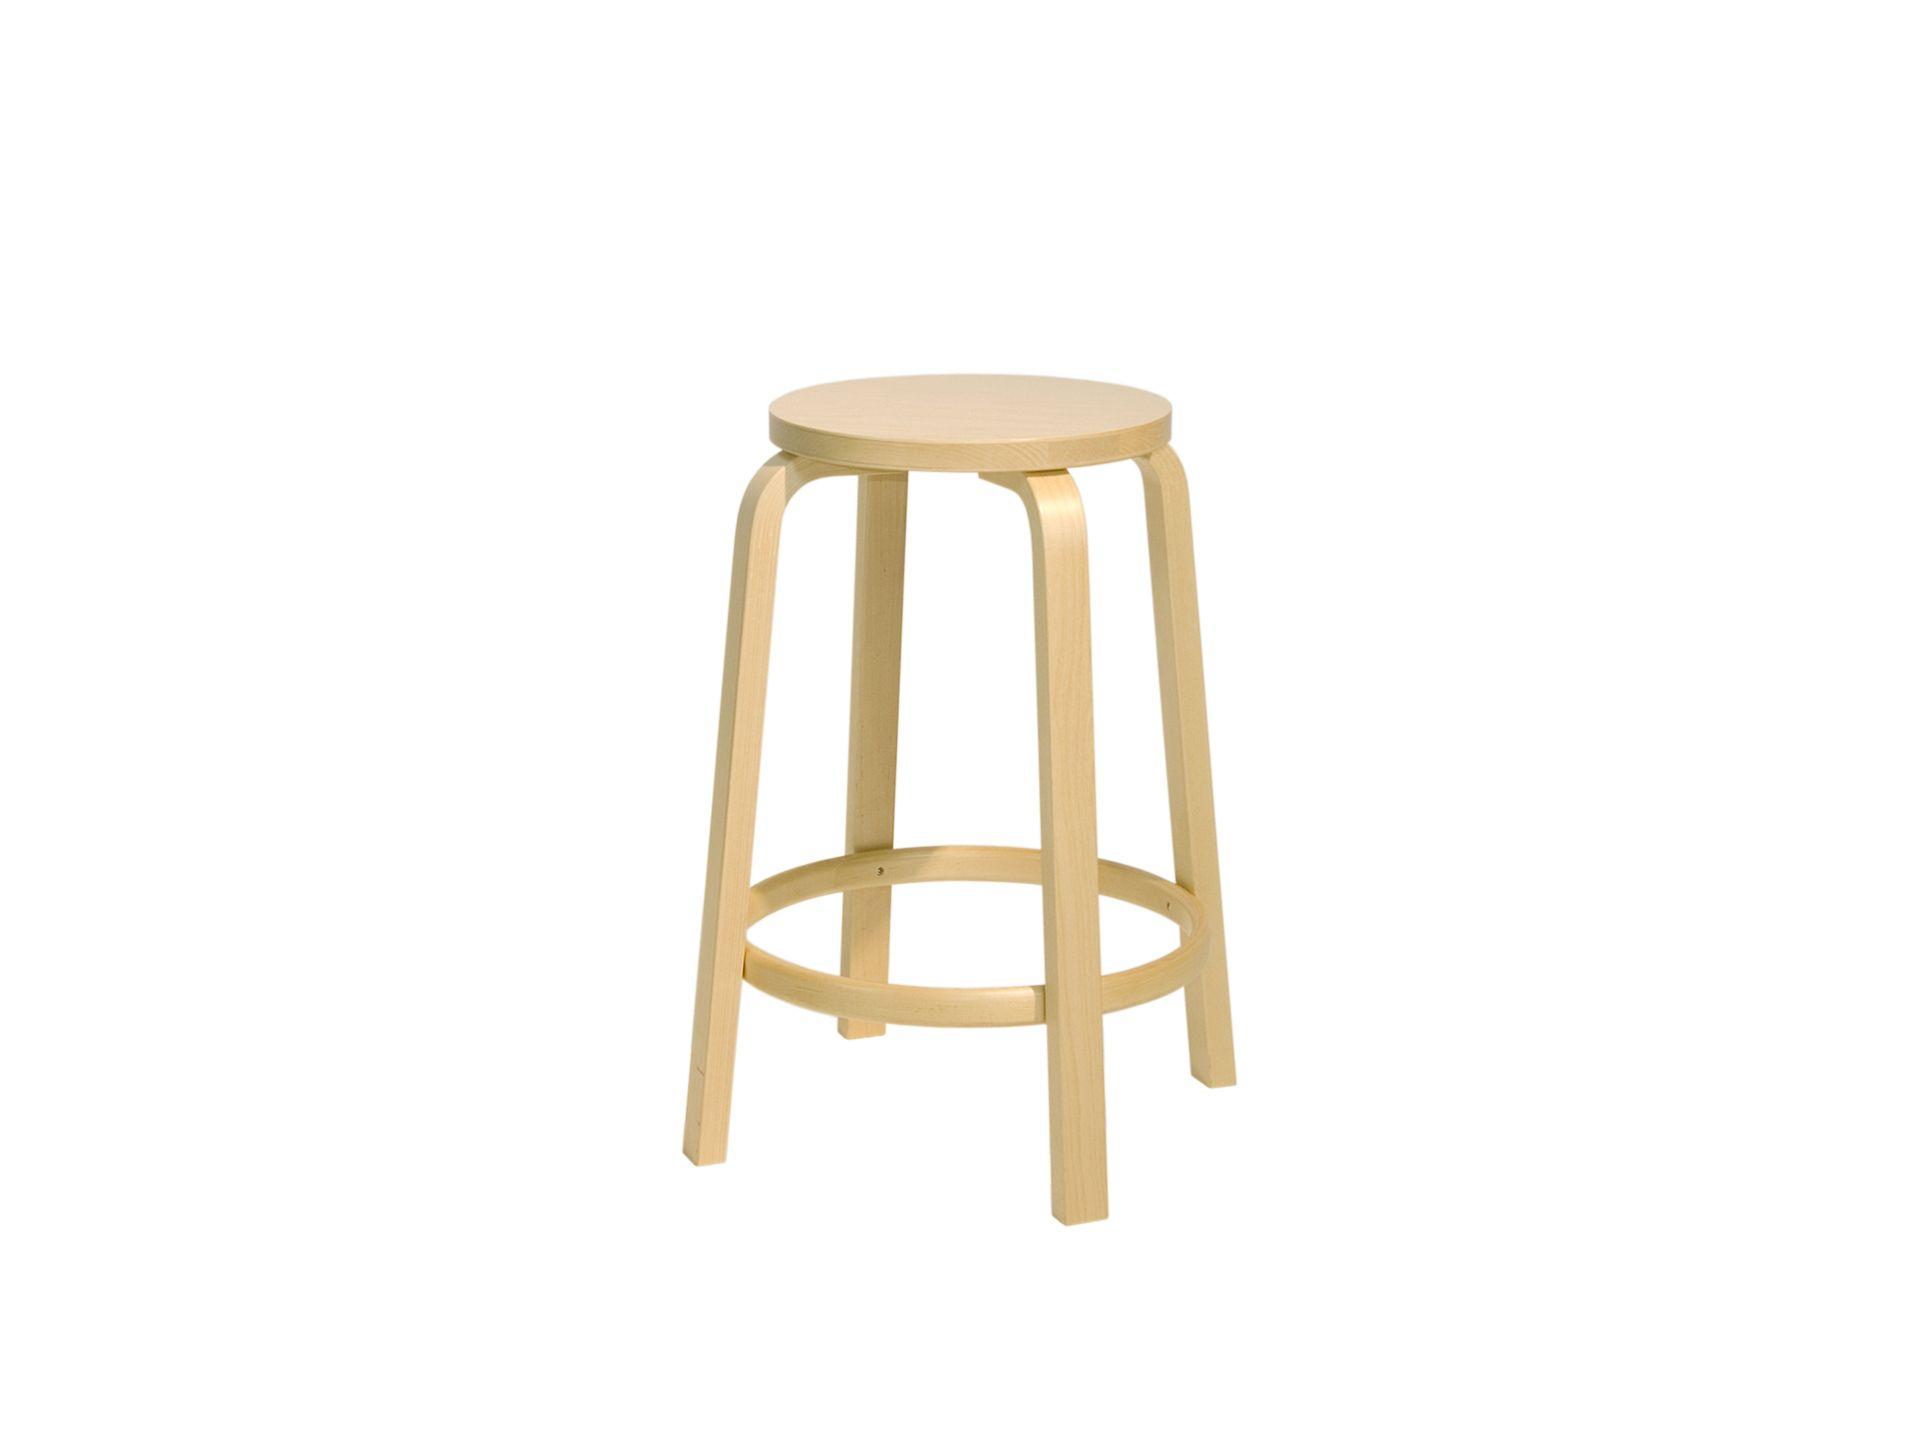 Alvar Aalto · Artek   Products   Chairs U0026 Stools   HIGH STOOL 64 Amazing Design